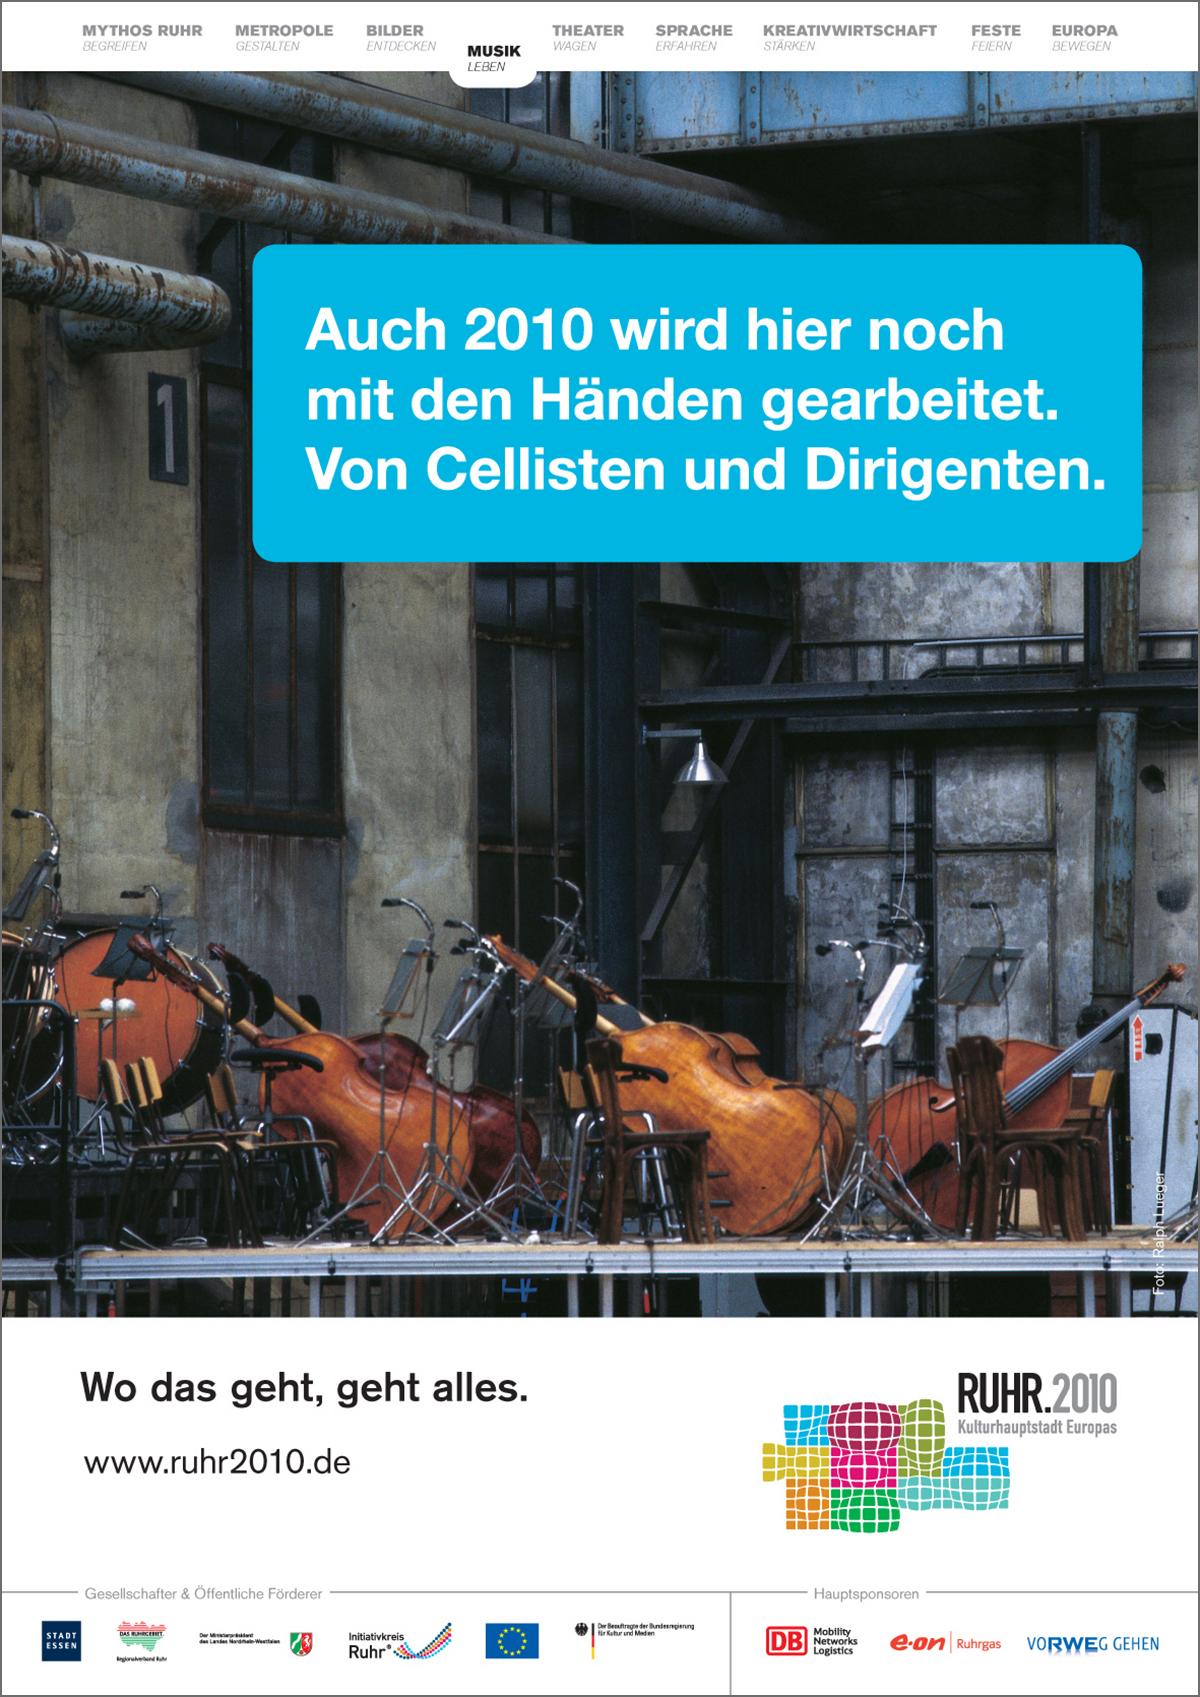 Motiv_3_Ruhr